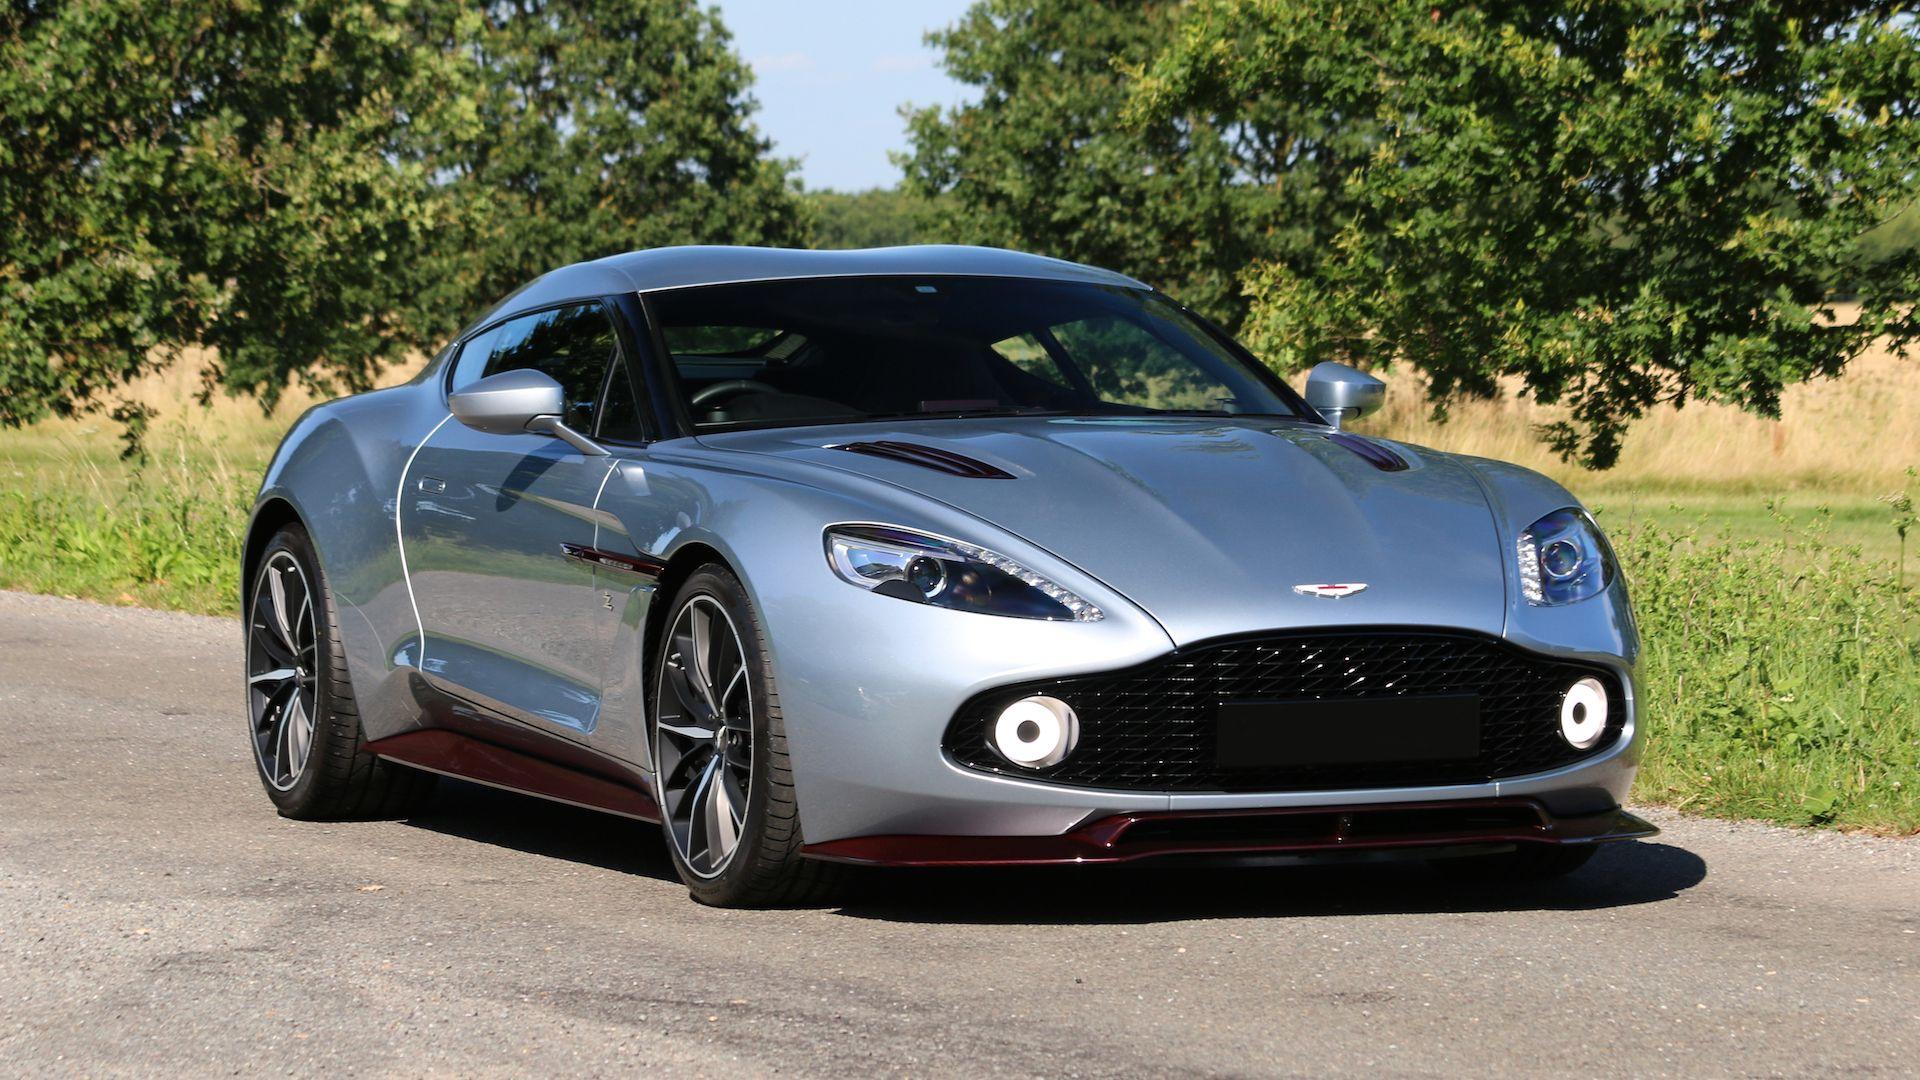 2018 Aston Martin V12 Vanquish Zagato Coupe For Sale Official Uk Koenigsegg Dealer Supervettura